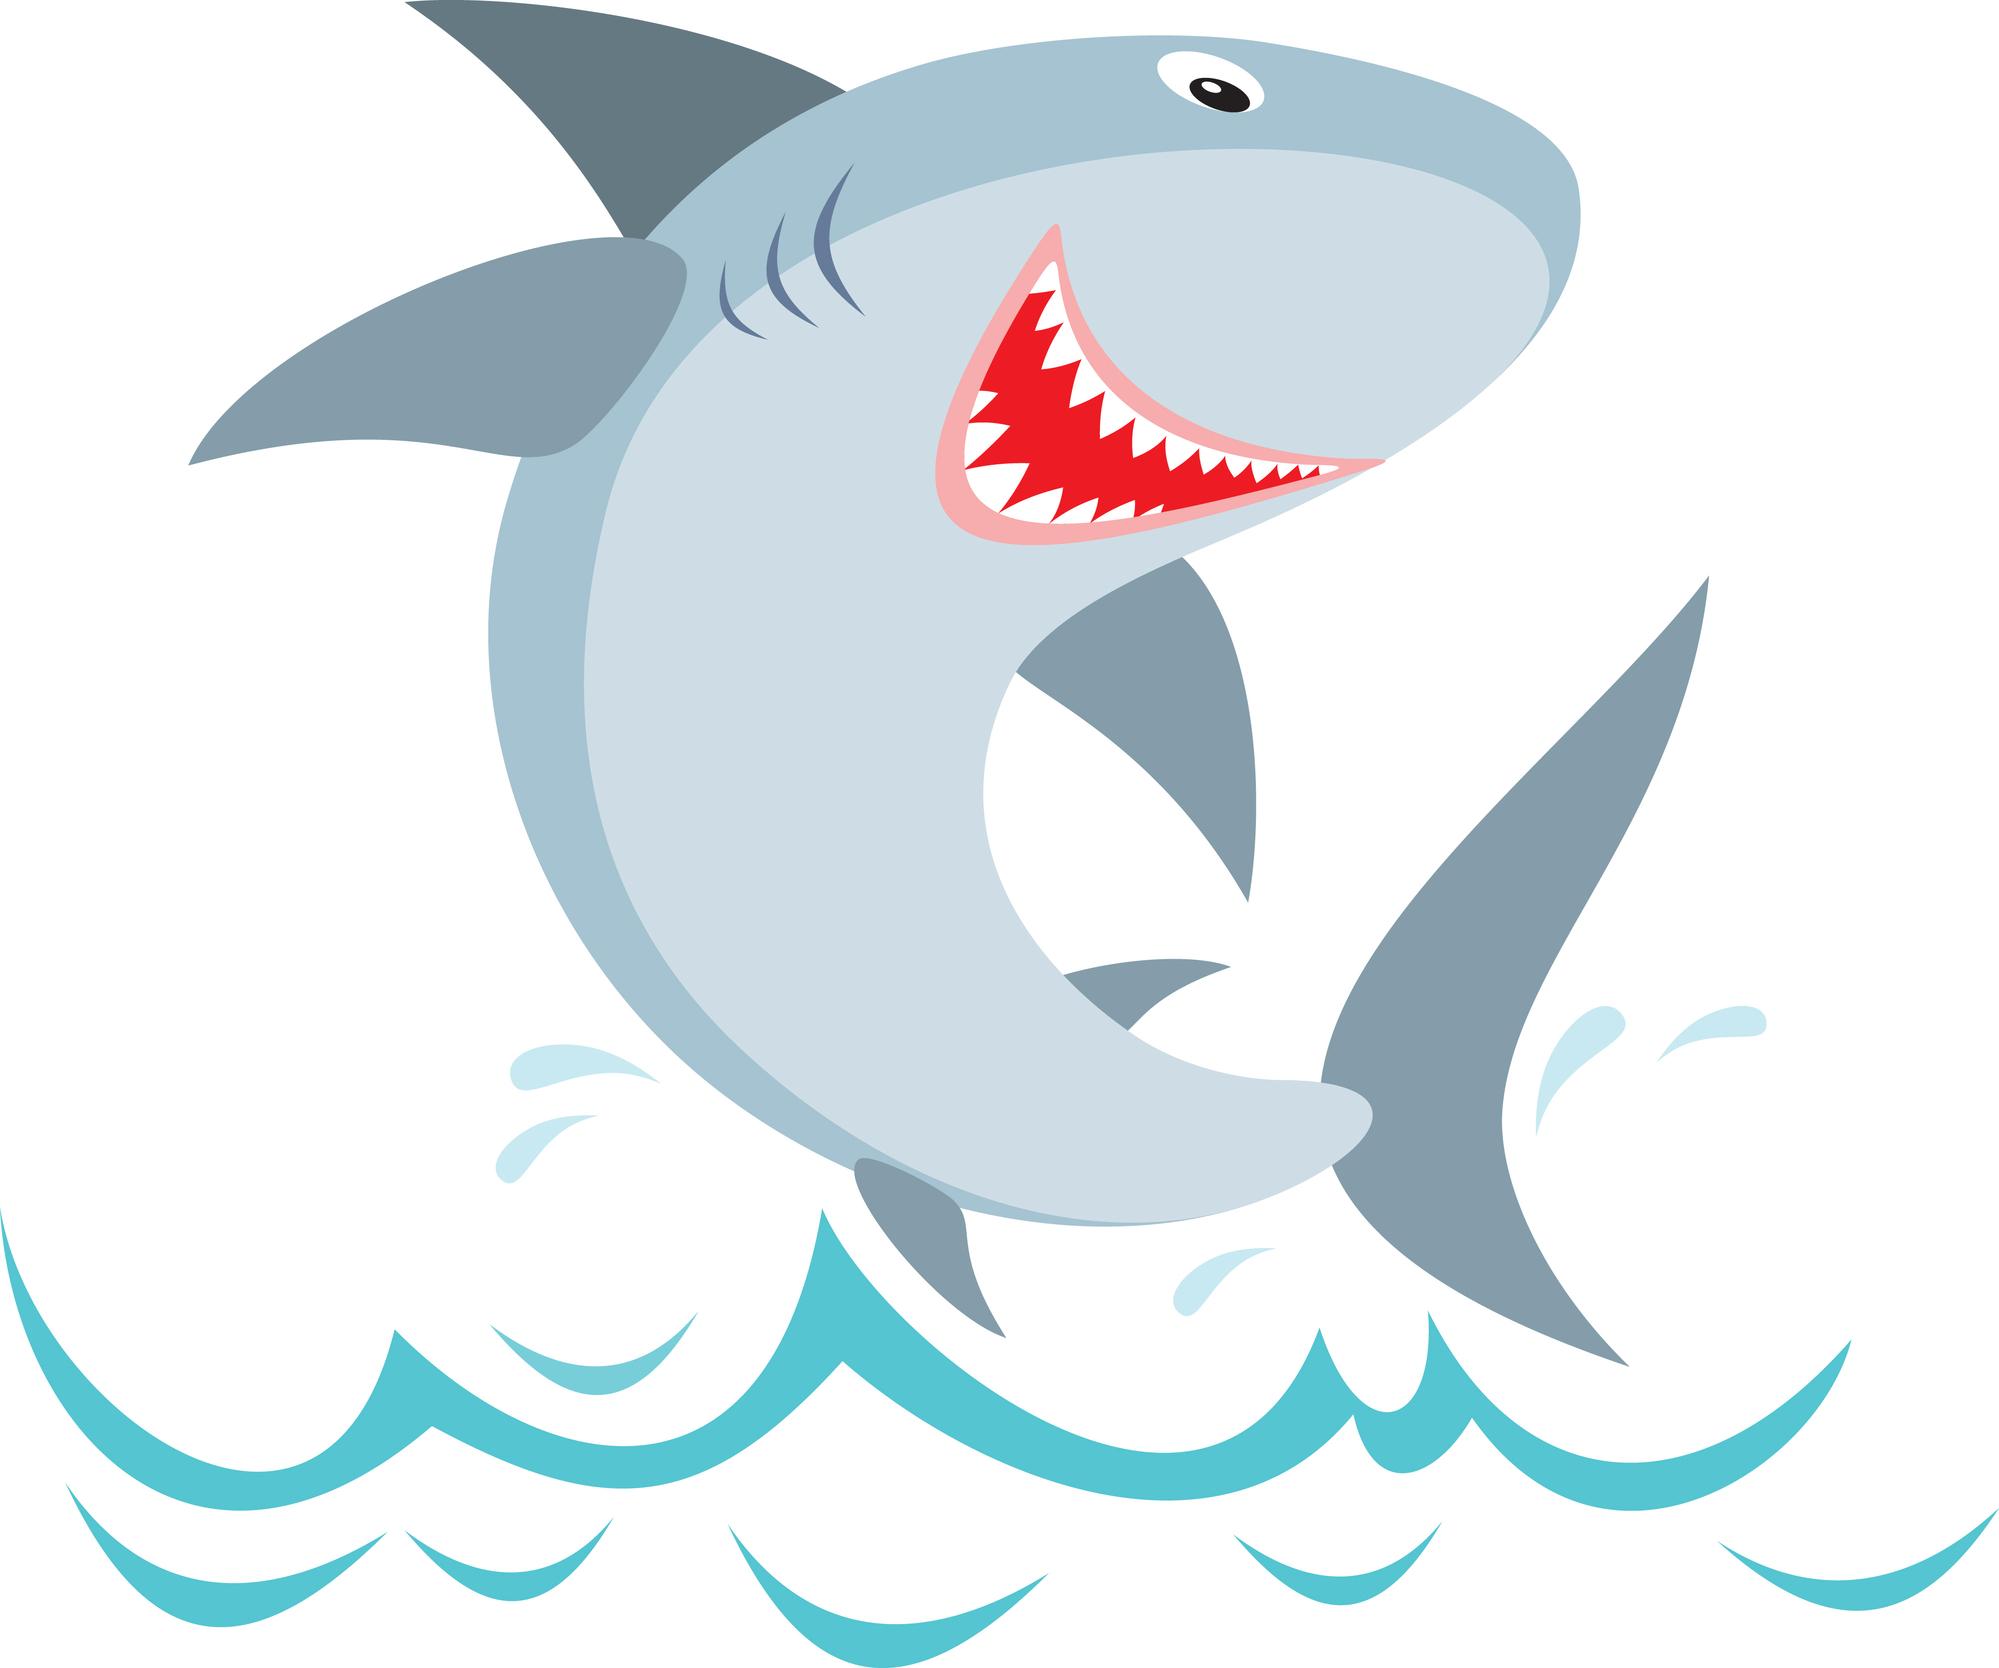 Marine Life clipart baby shark Shark shark Gallery Noahs birthday